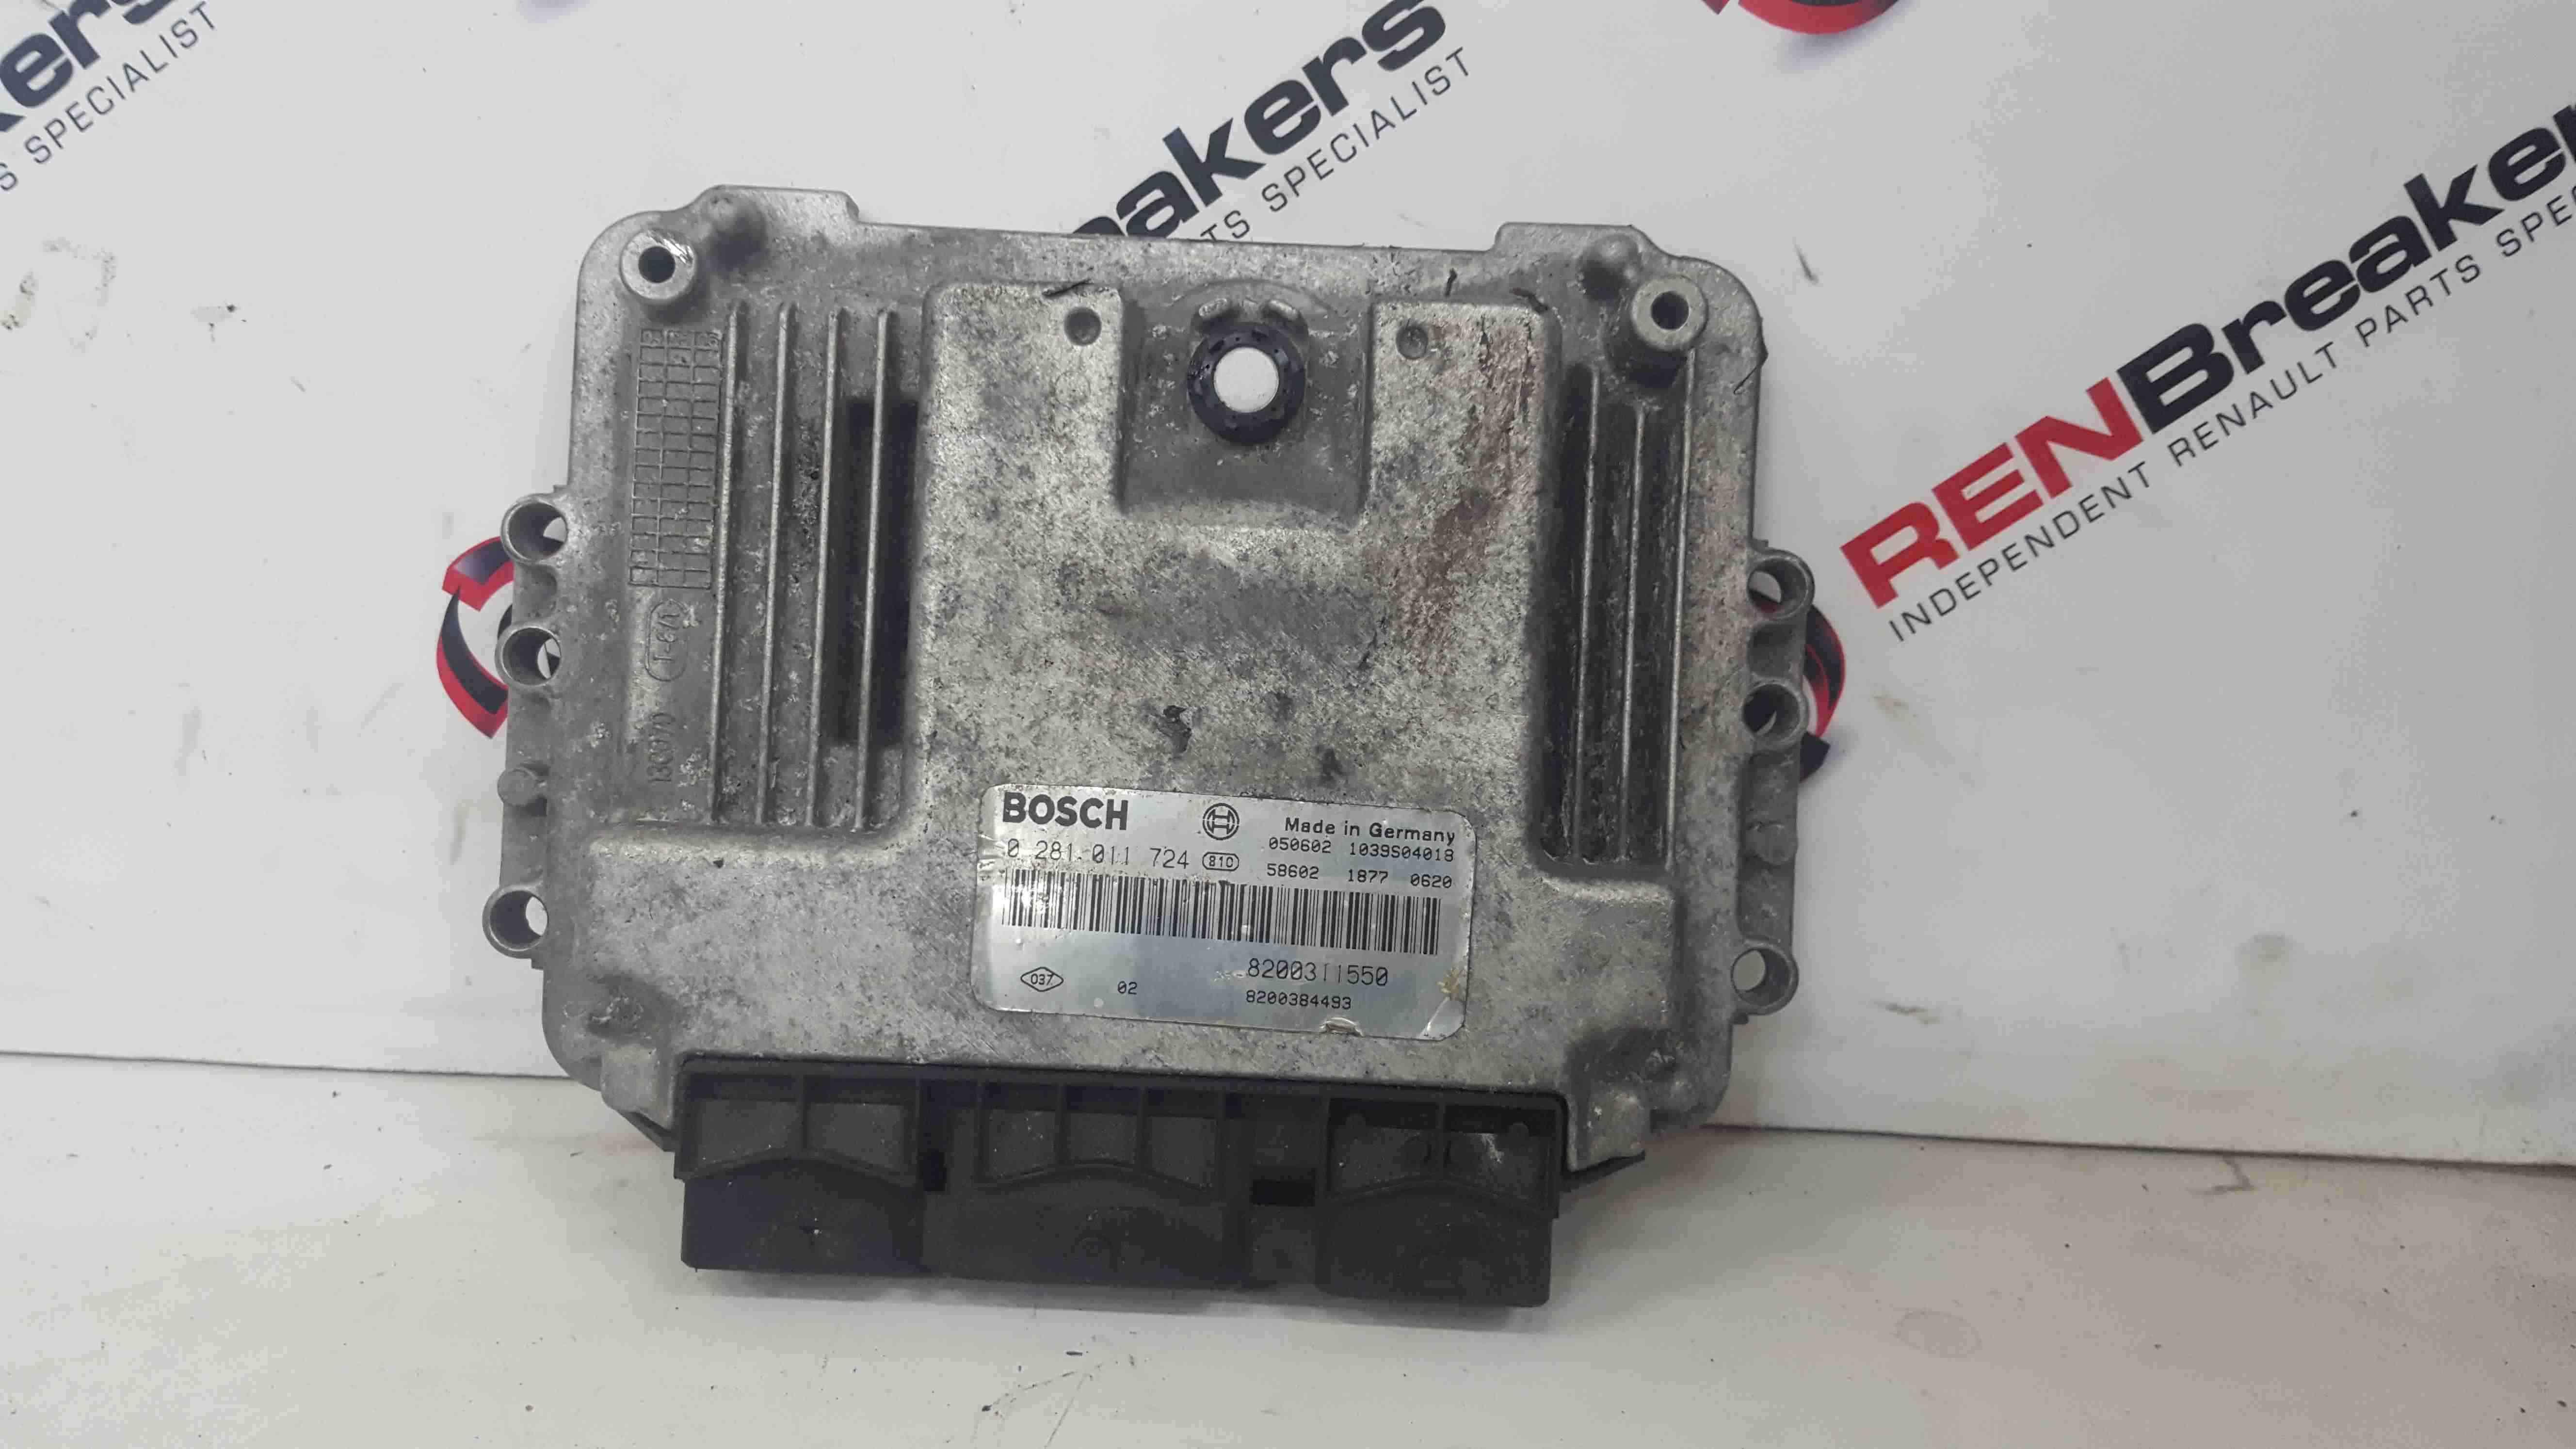 Renault Espace 2003-2013 2.2 DCi Engine Control Unit ECU 8200311550 8200384493